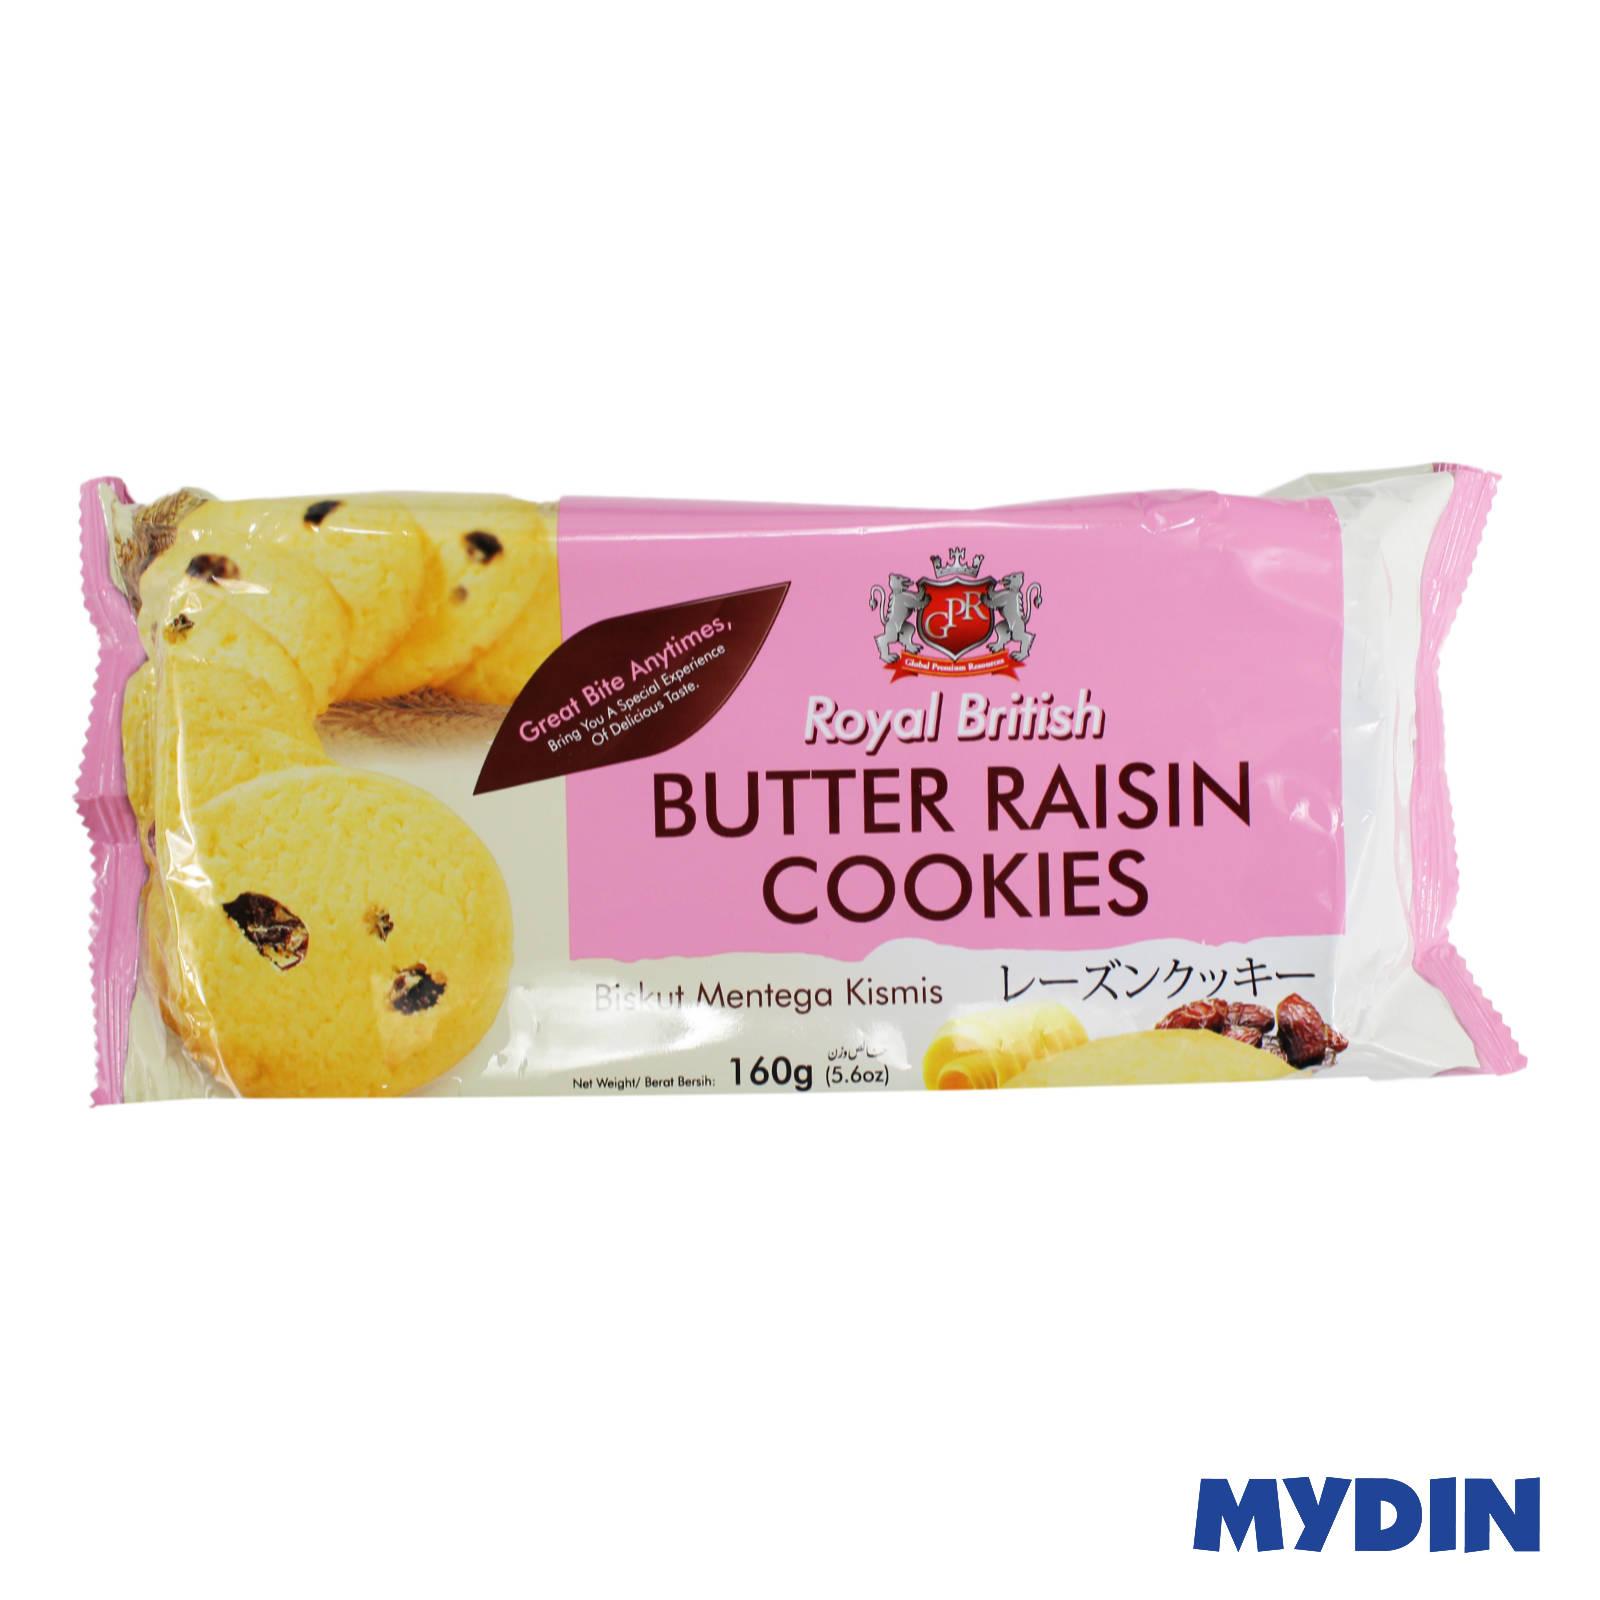 GPR Royal British Butter Raisin Cookies 160g